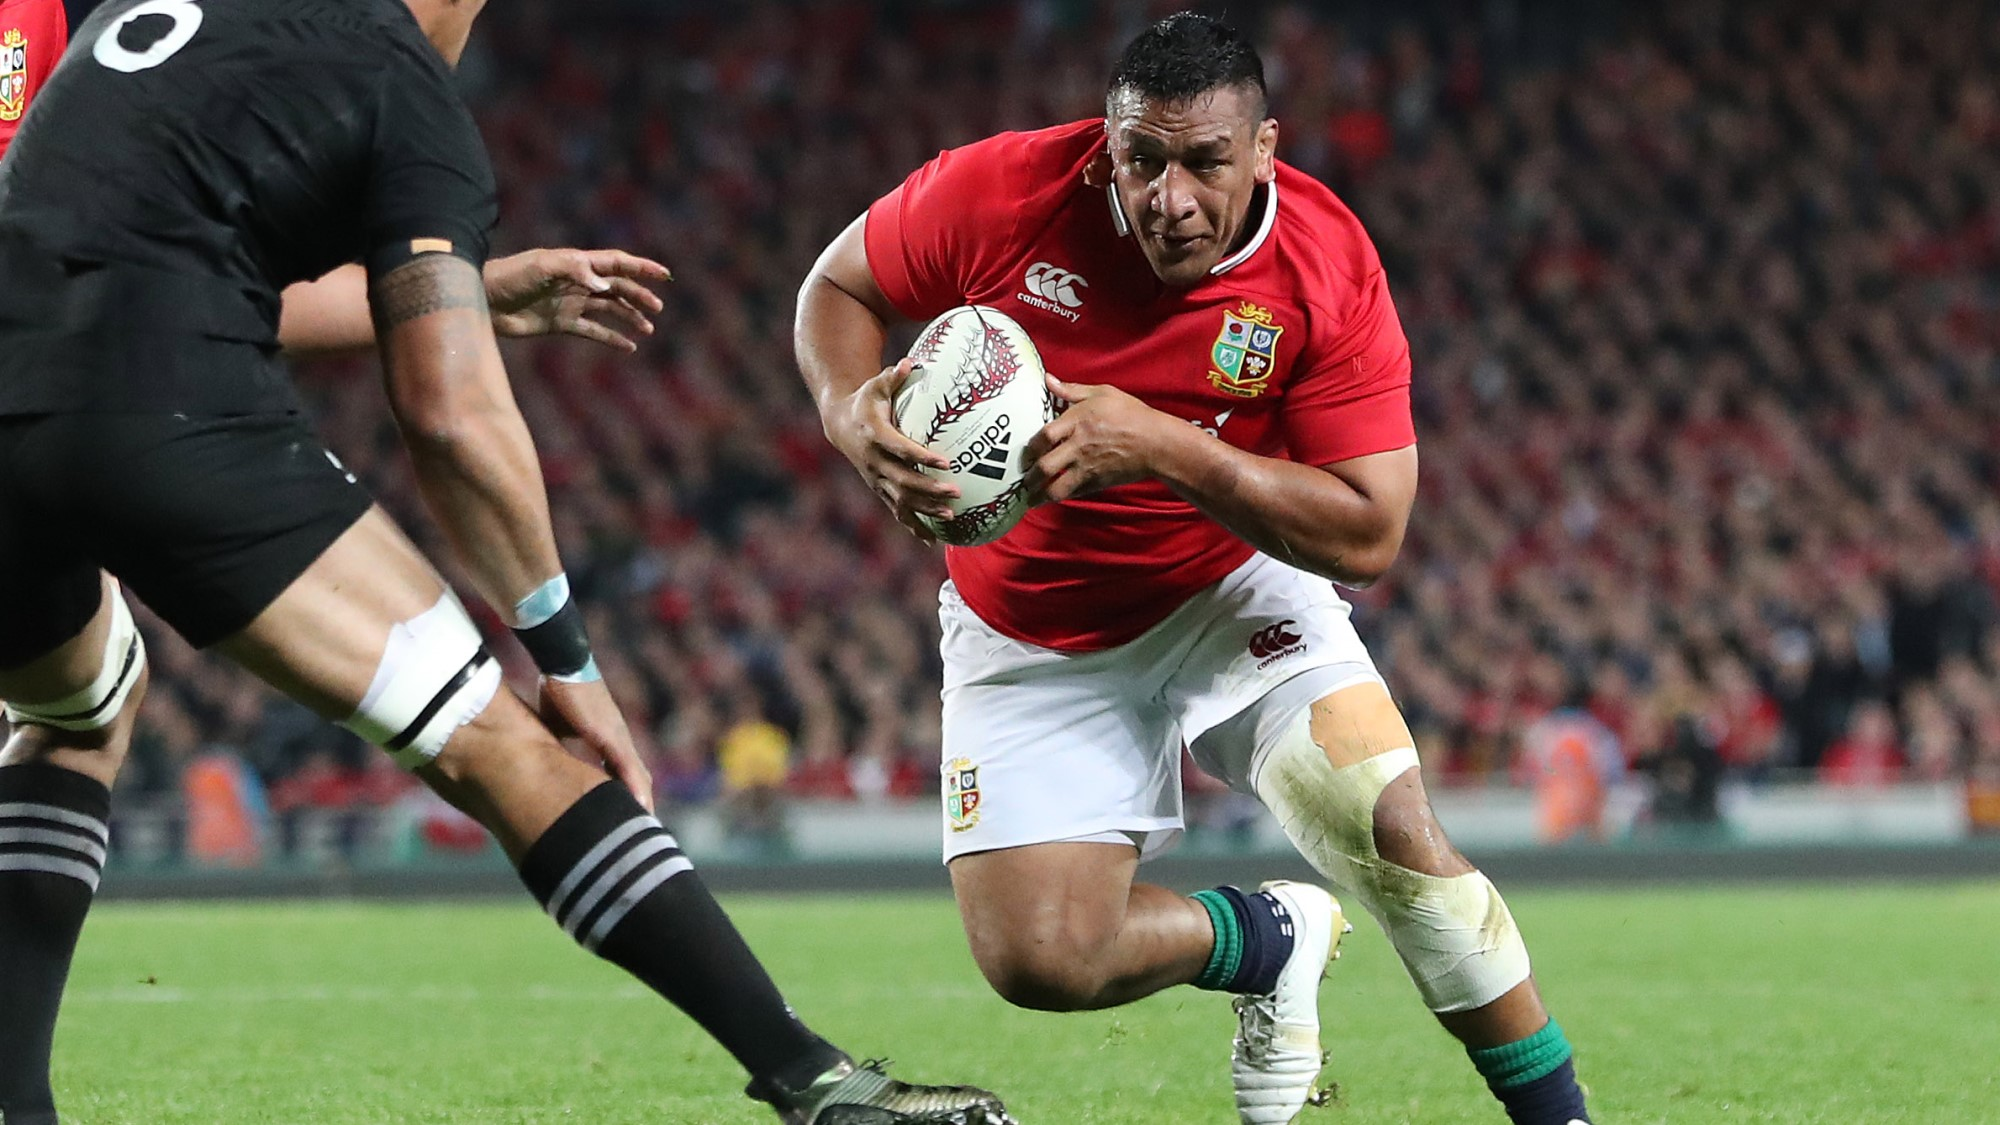 2017 Lions Player Retrospective: Mako Vunipola